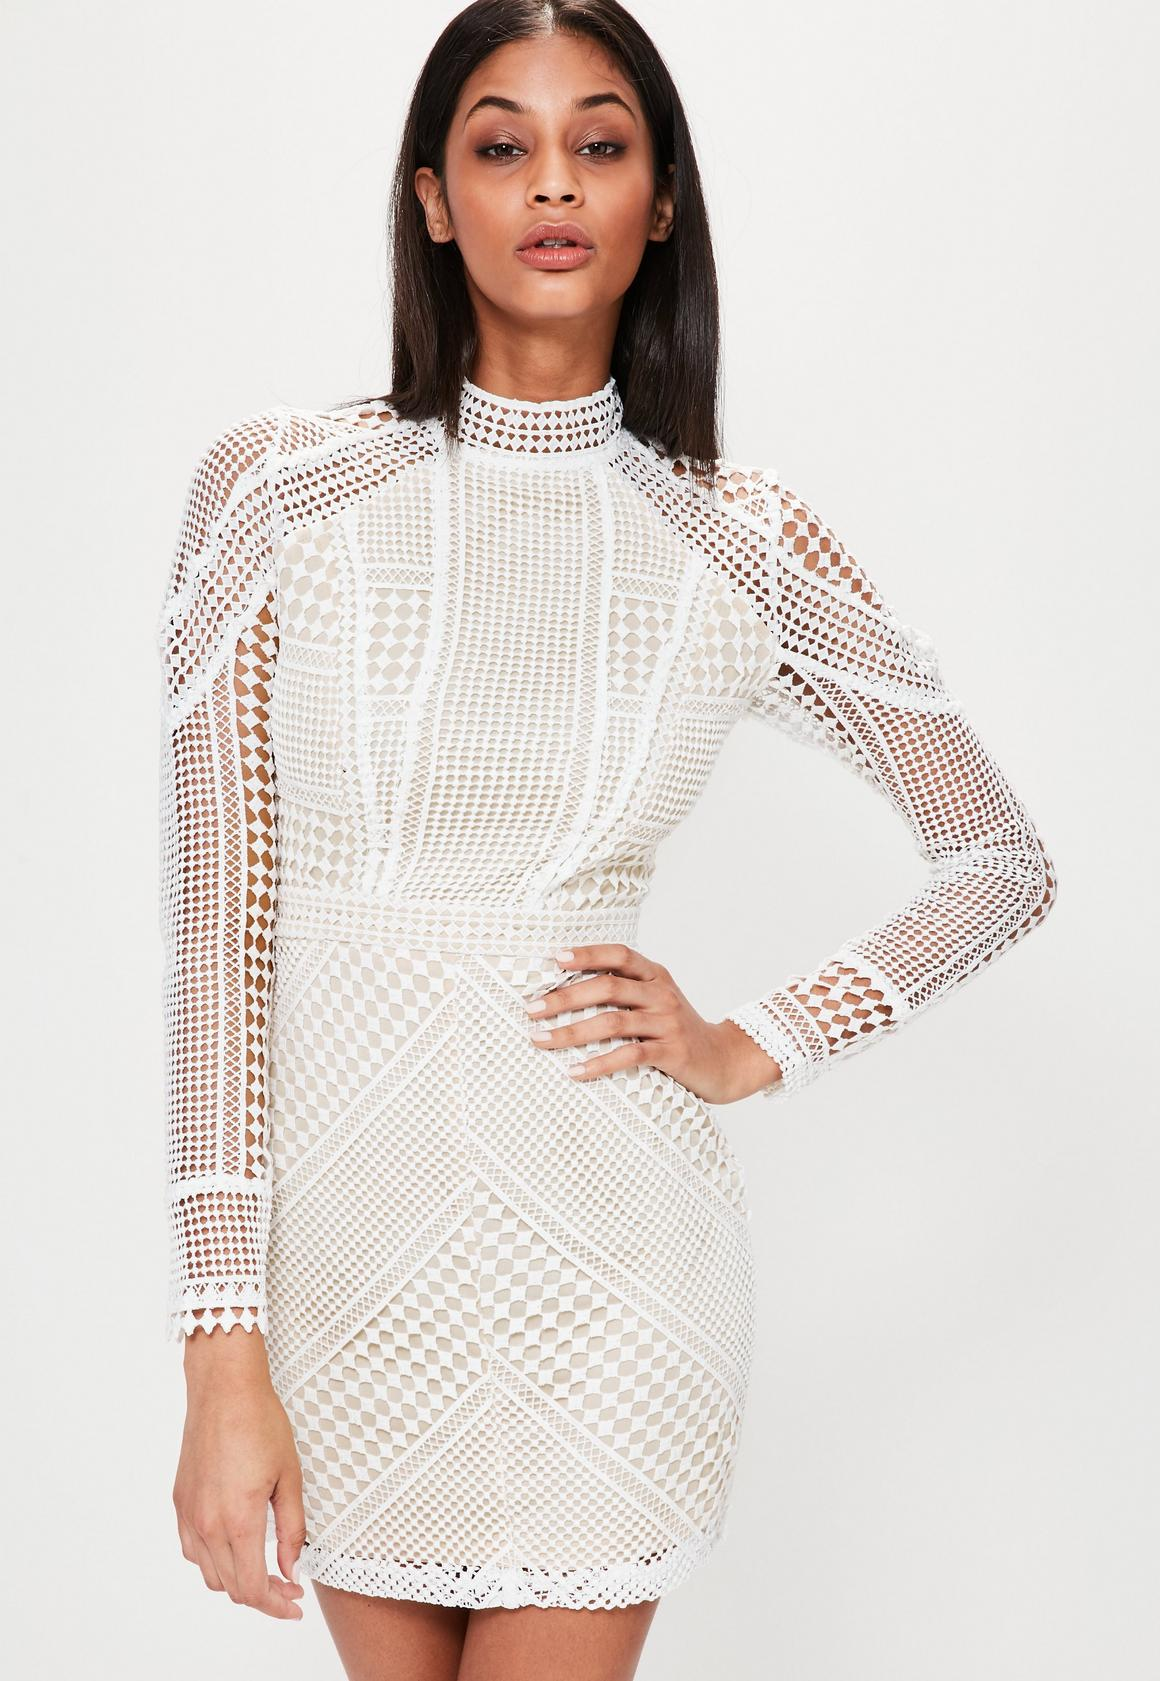 Structured High Neck Premium Lace Mini Dress White   Missguided